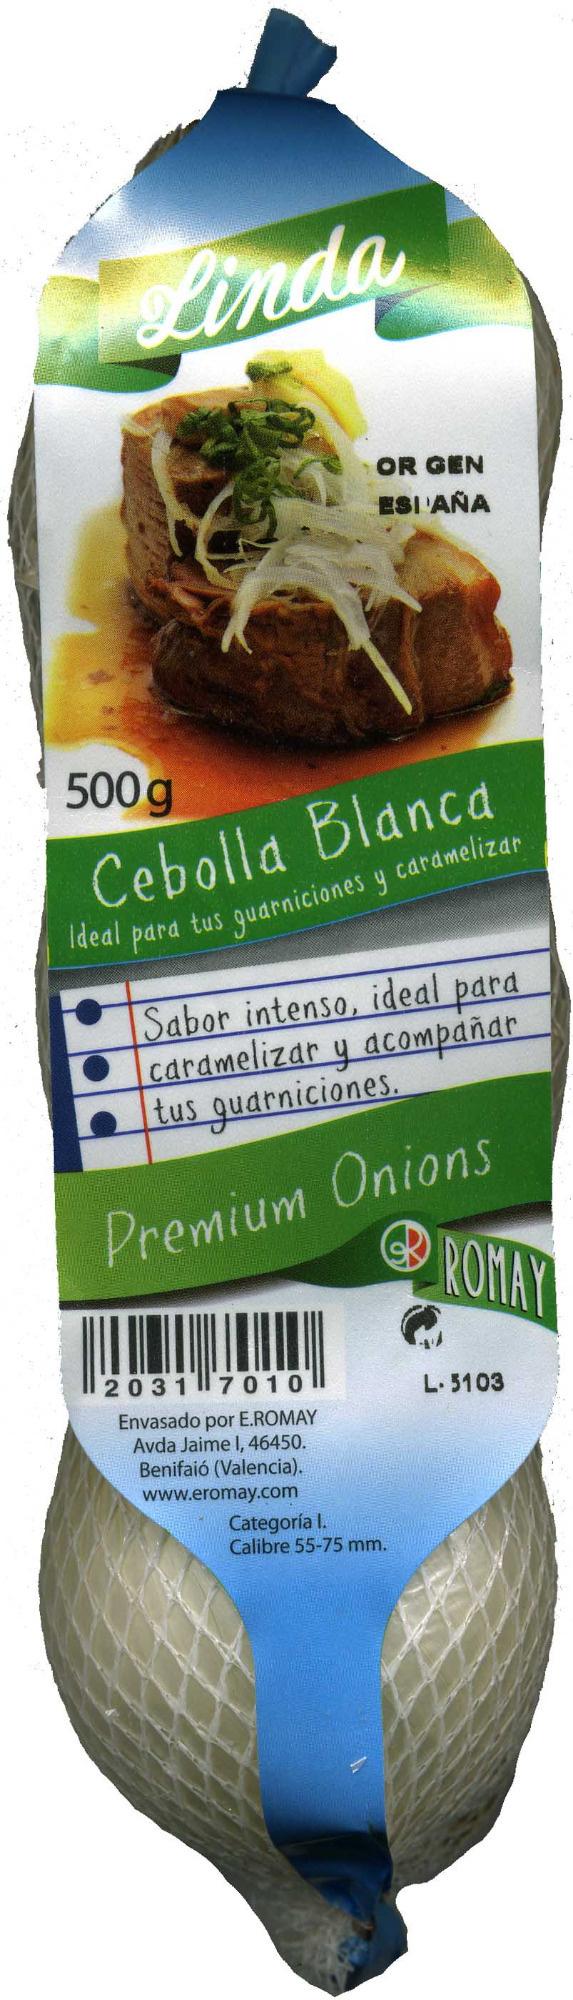 "Cebollas ""Romay"" - Producte"